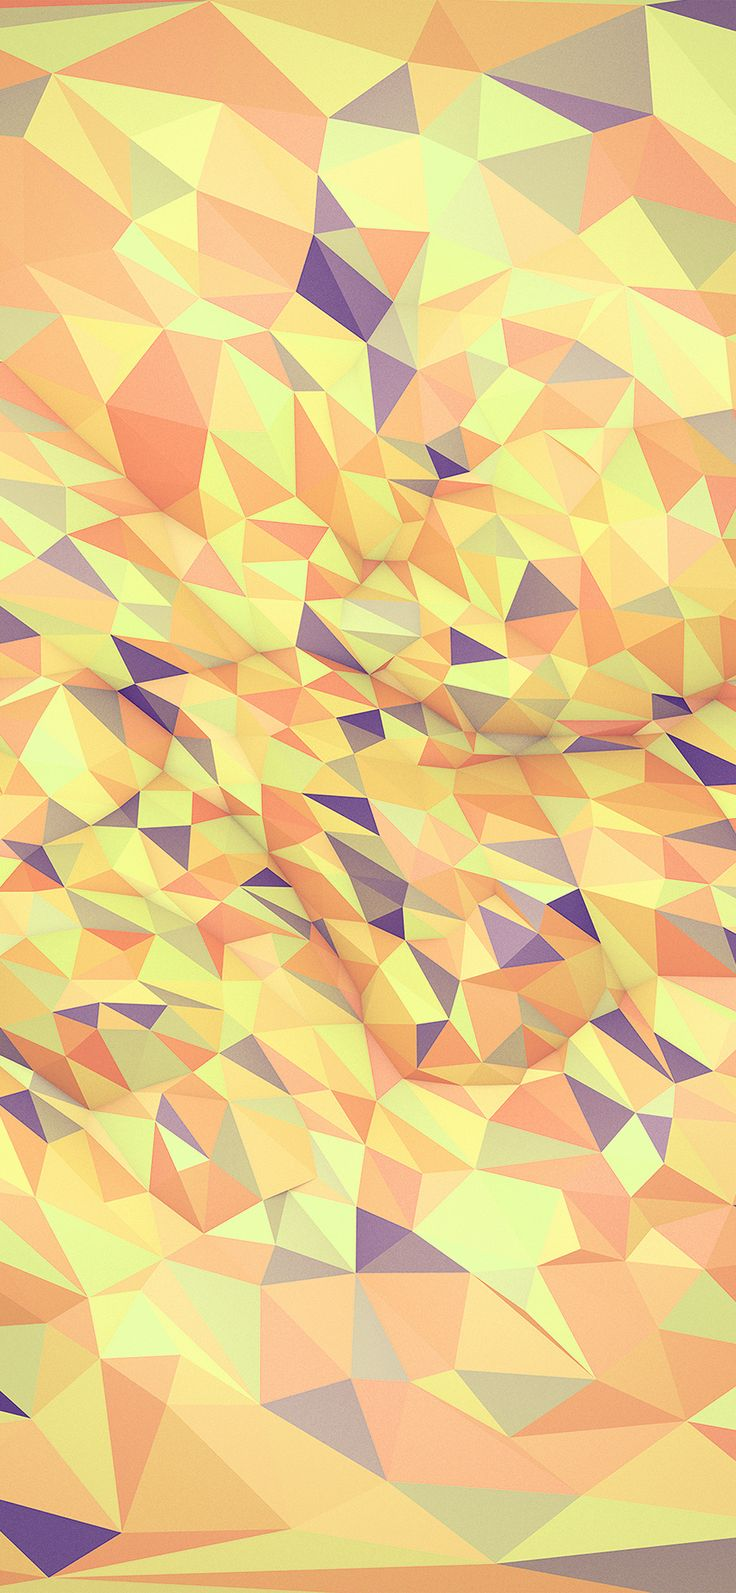 vr58-metaphysics-hampus-olsson-art-orange-yellow-polygon-pattern via iPhoneXpape... vr58-metaphysics-hampus-olsson-art-orange-yellow-polygon-pattern via <a href=